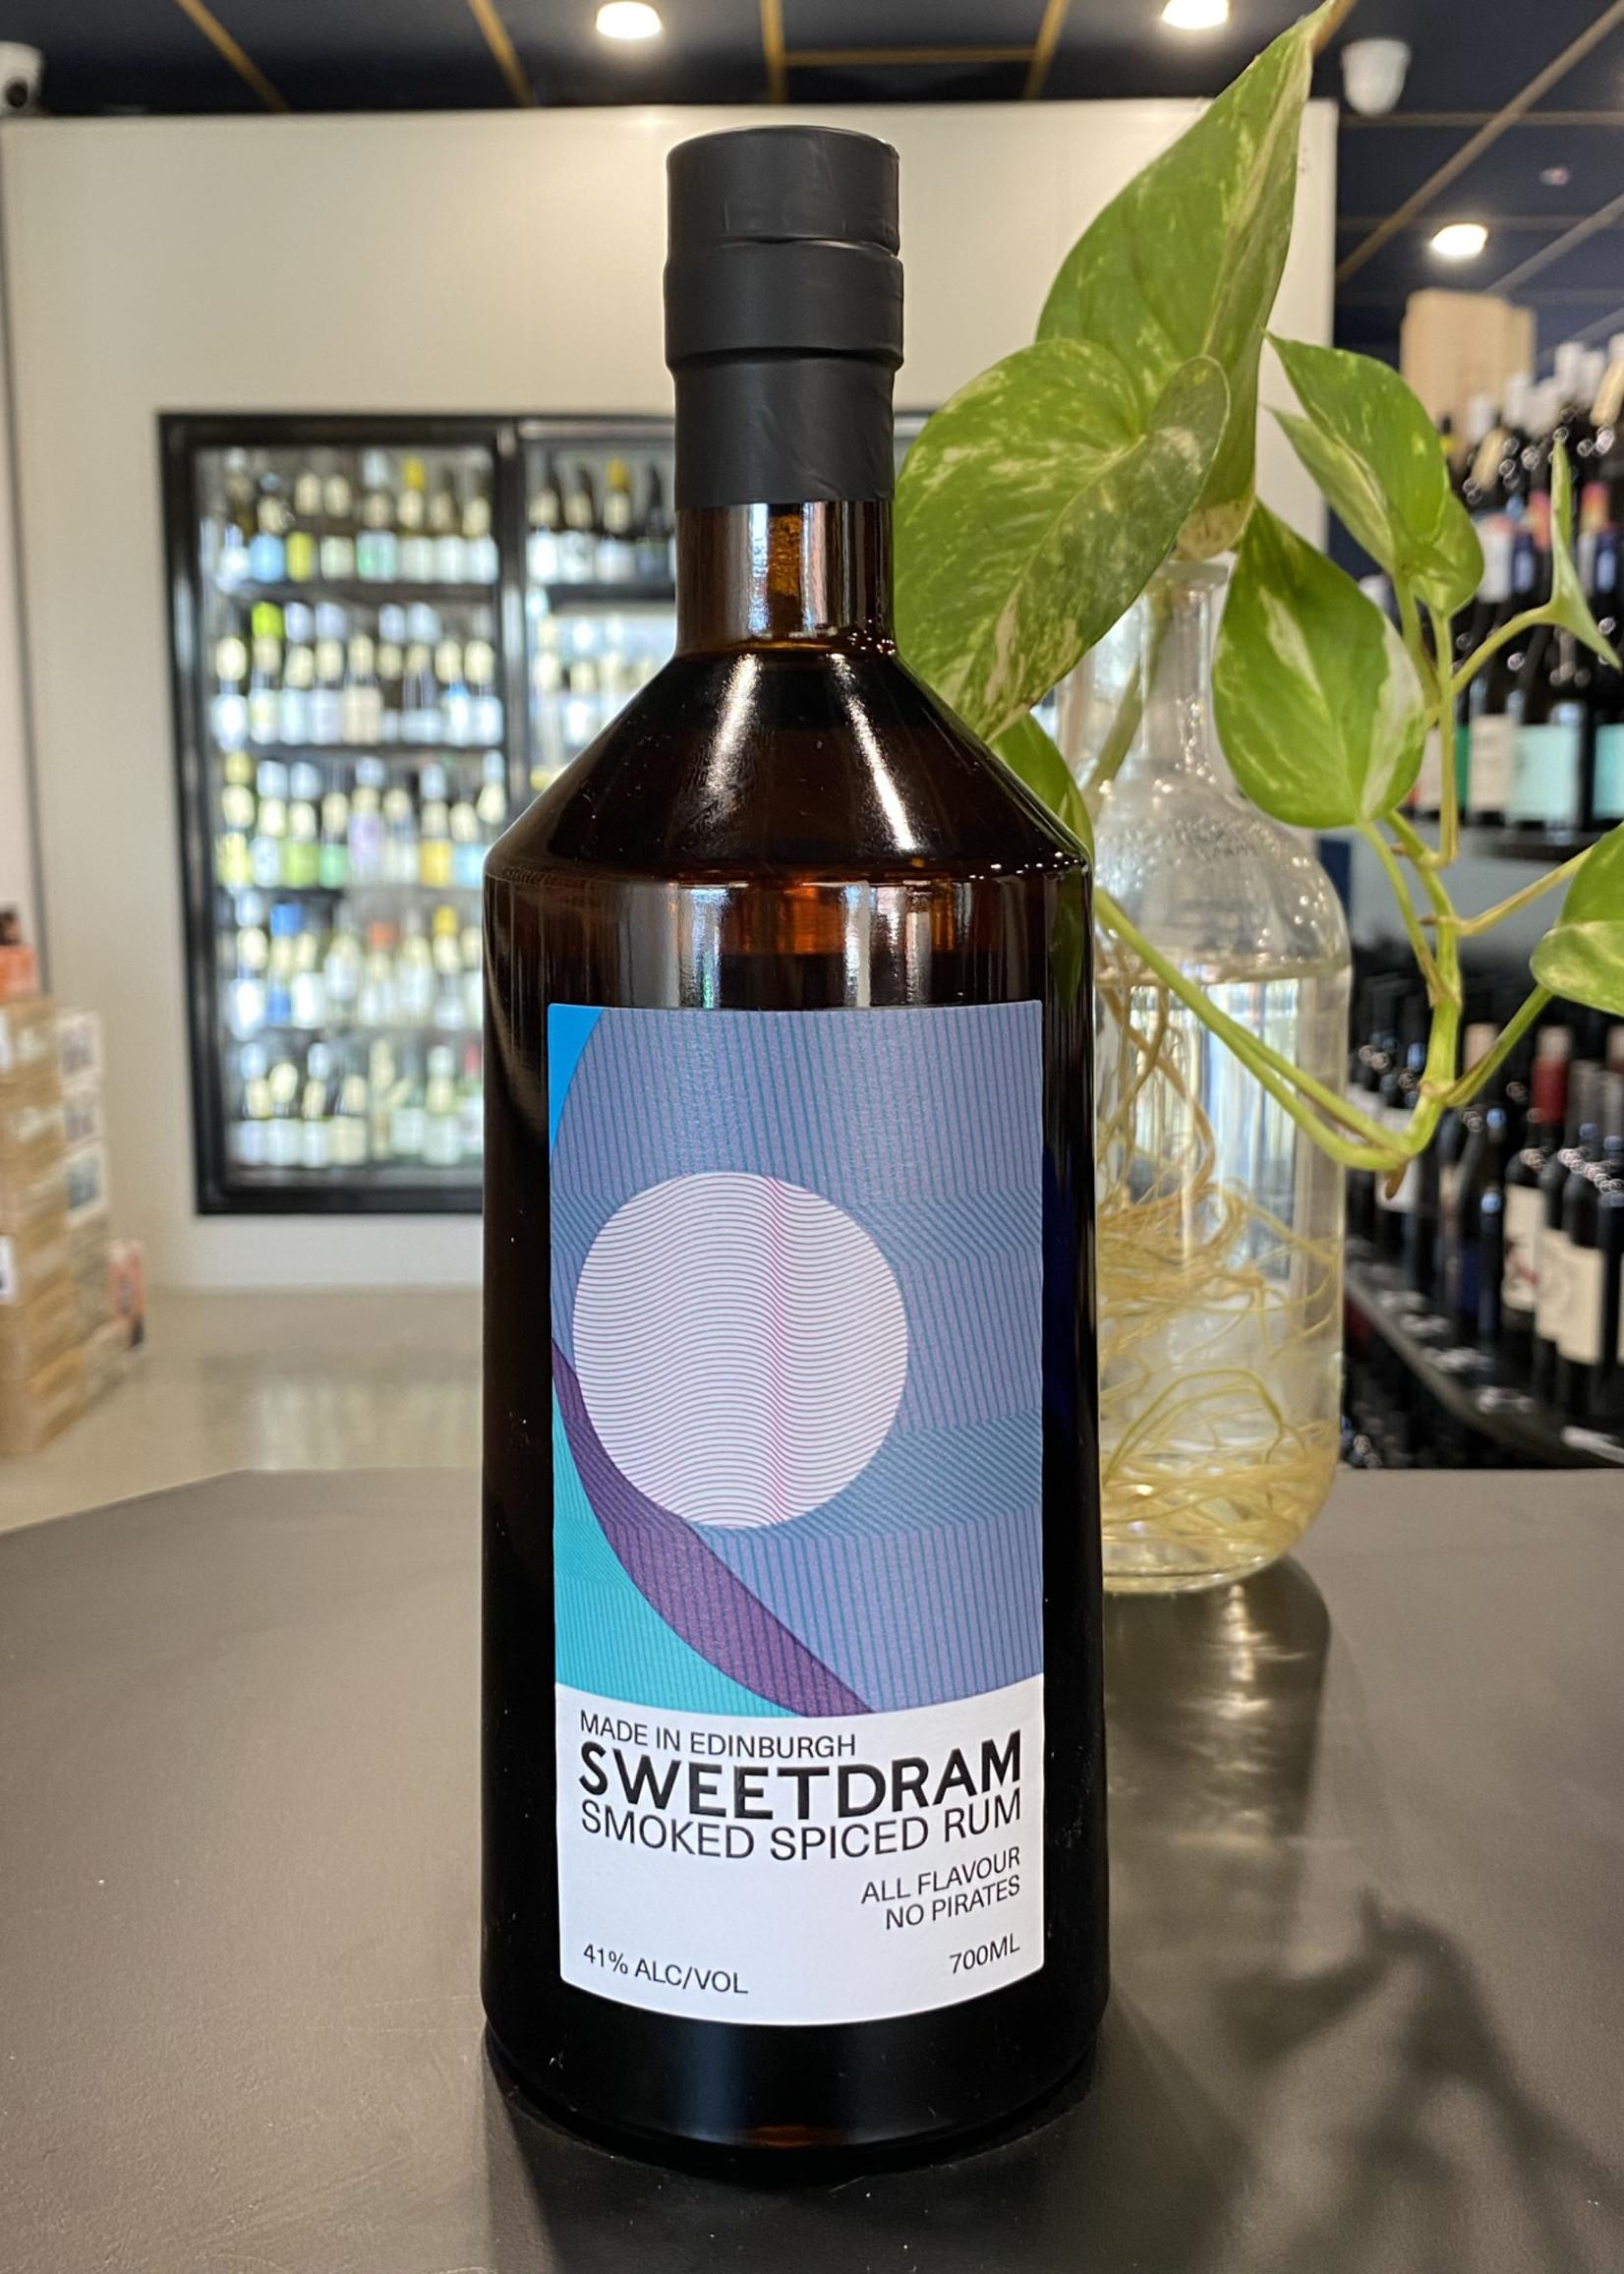 Sweetdram Sweetdram Smoked Spiced Rum